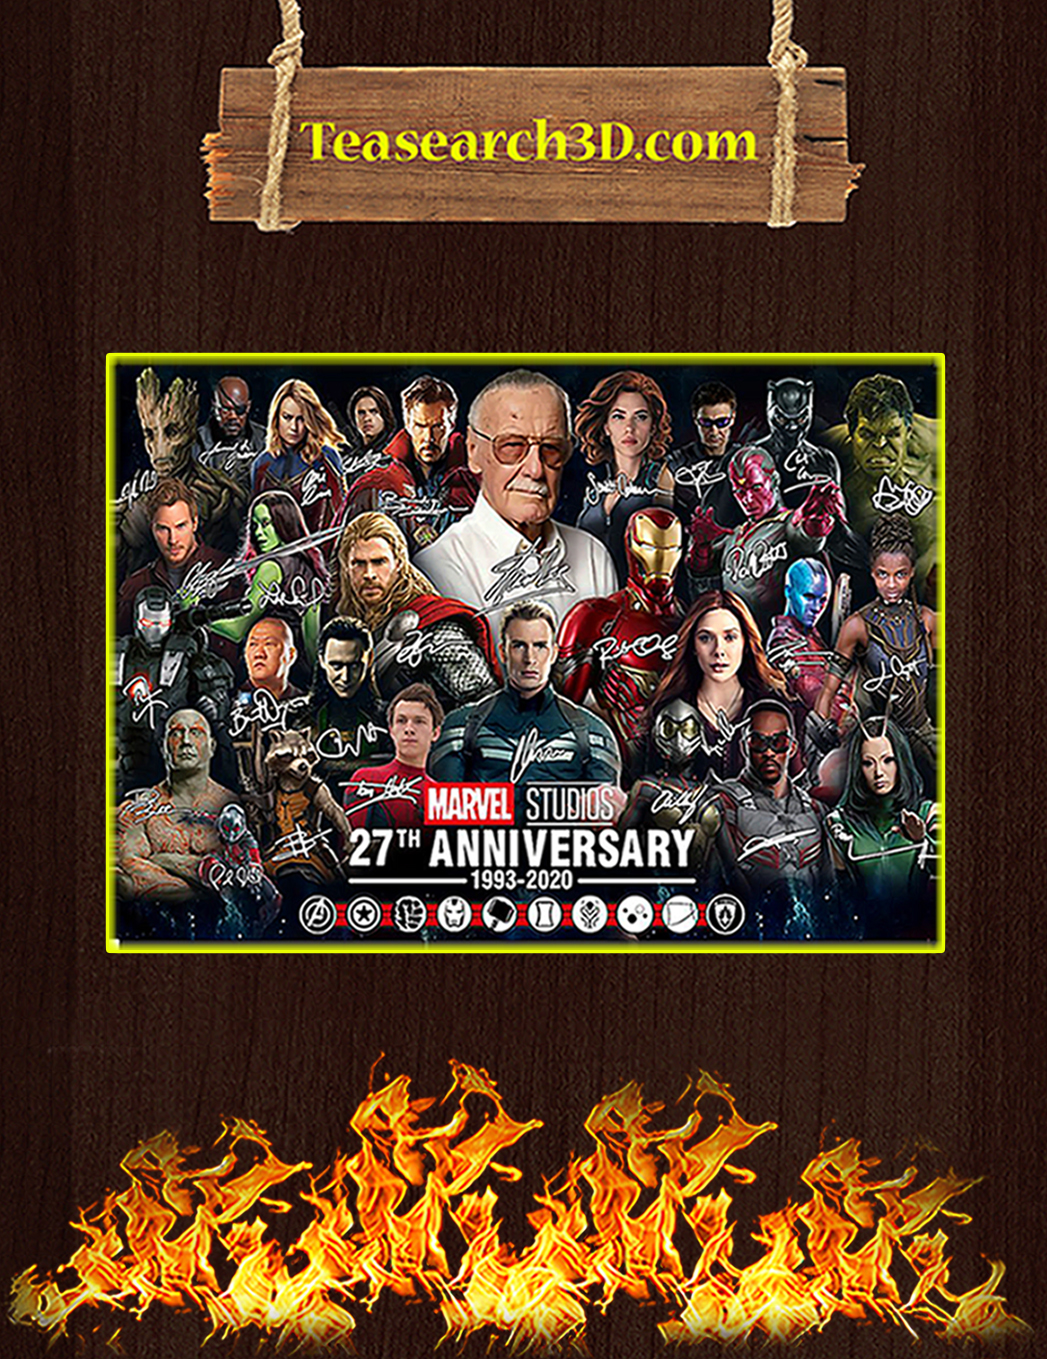 Marvel studios 27th anniversary signature poster A1